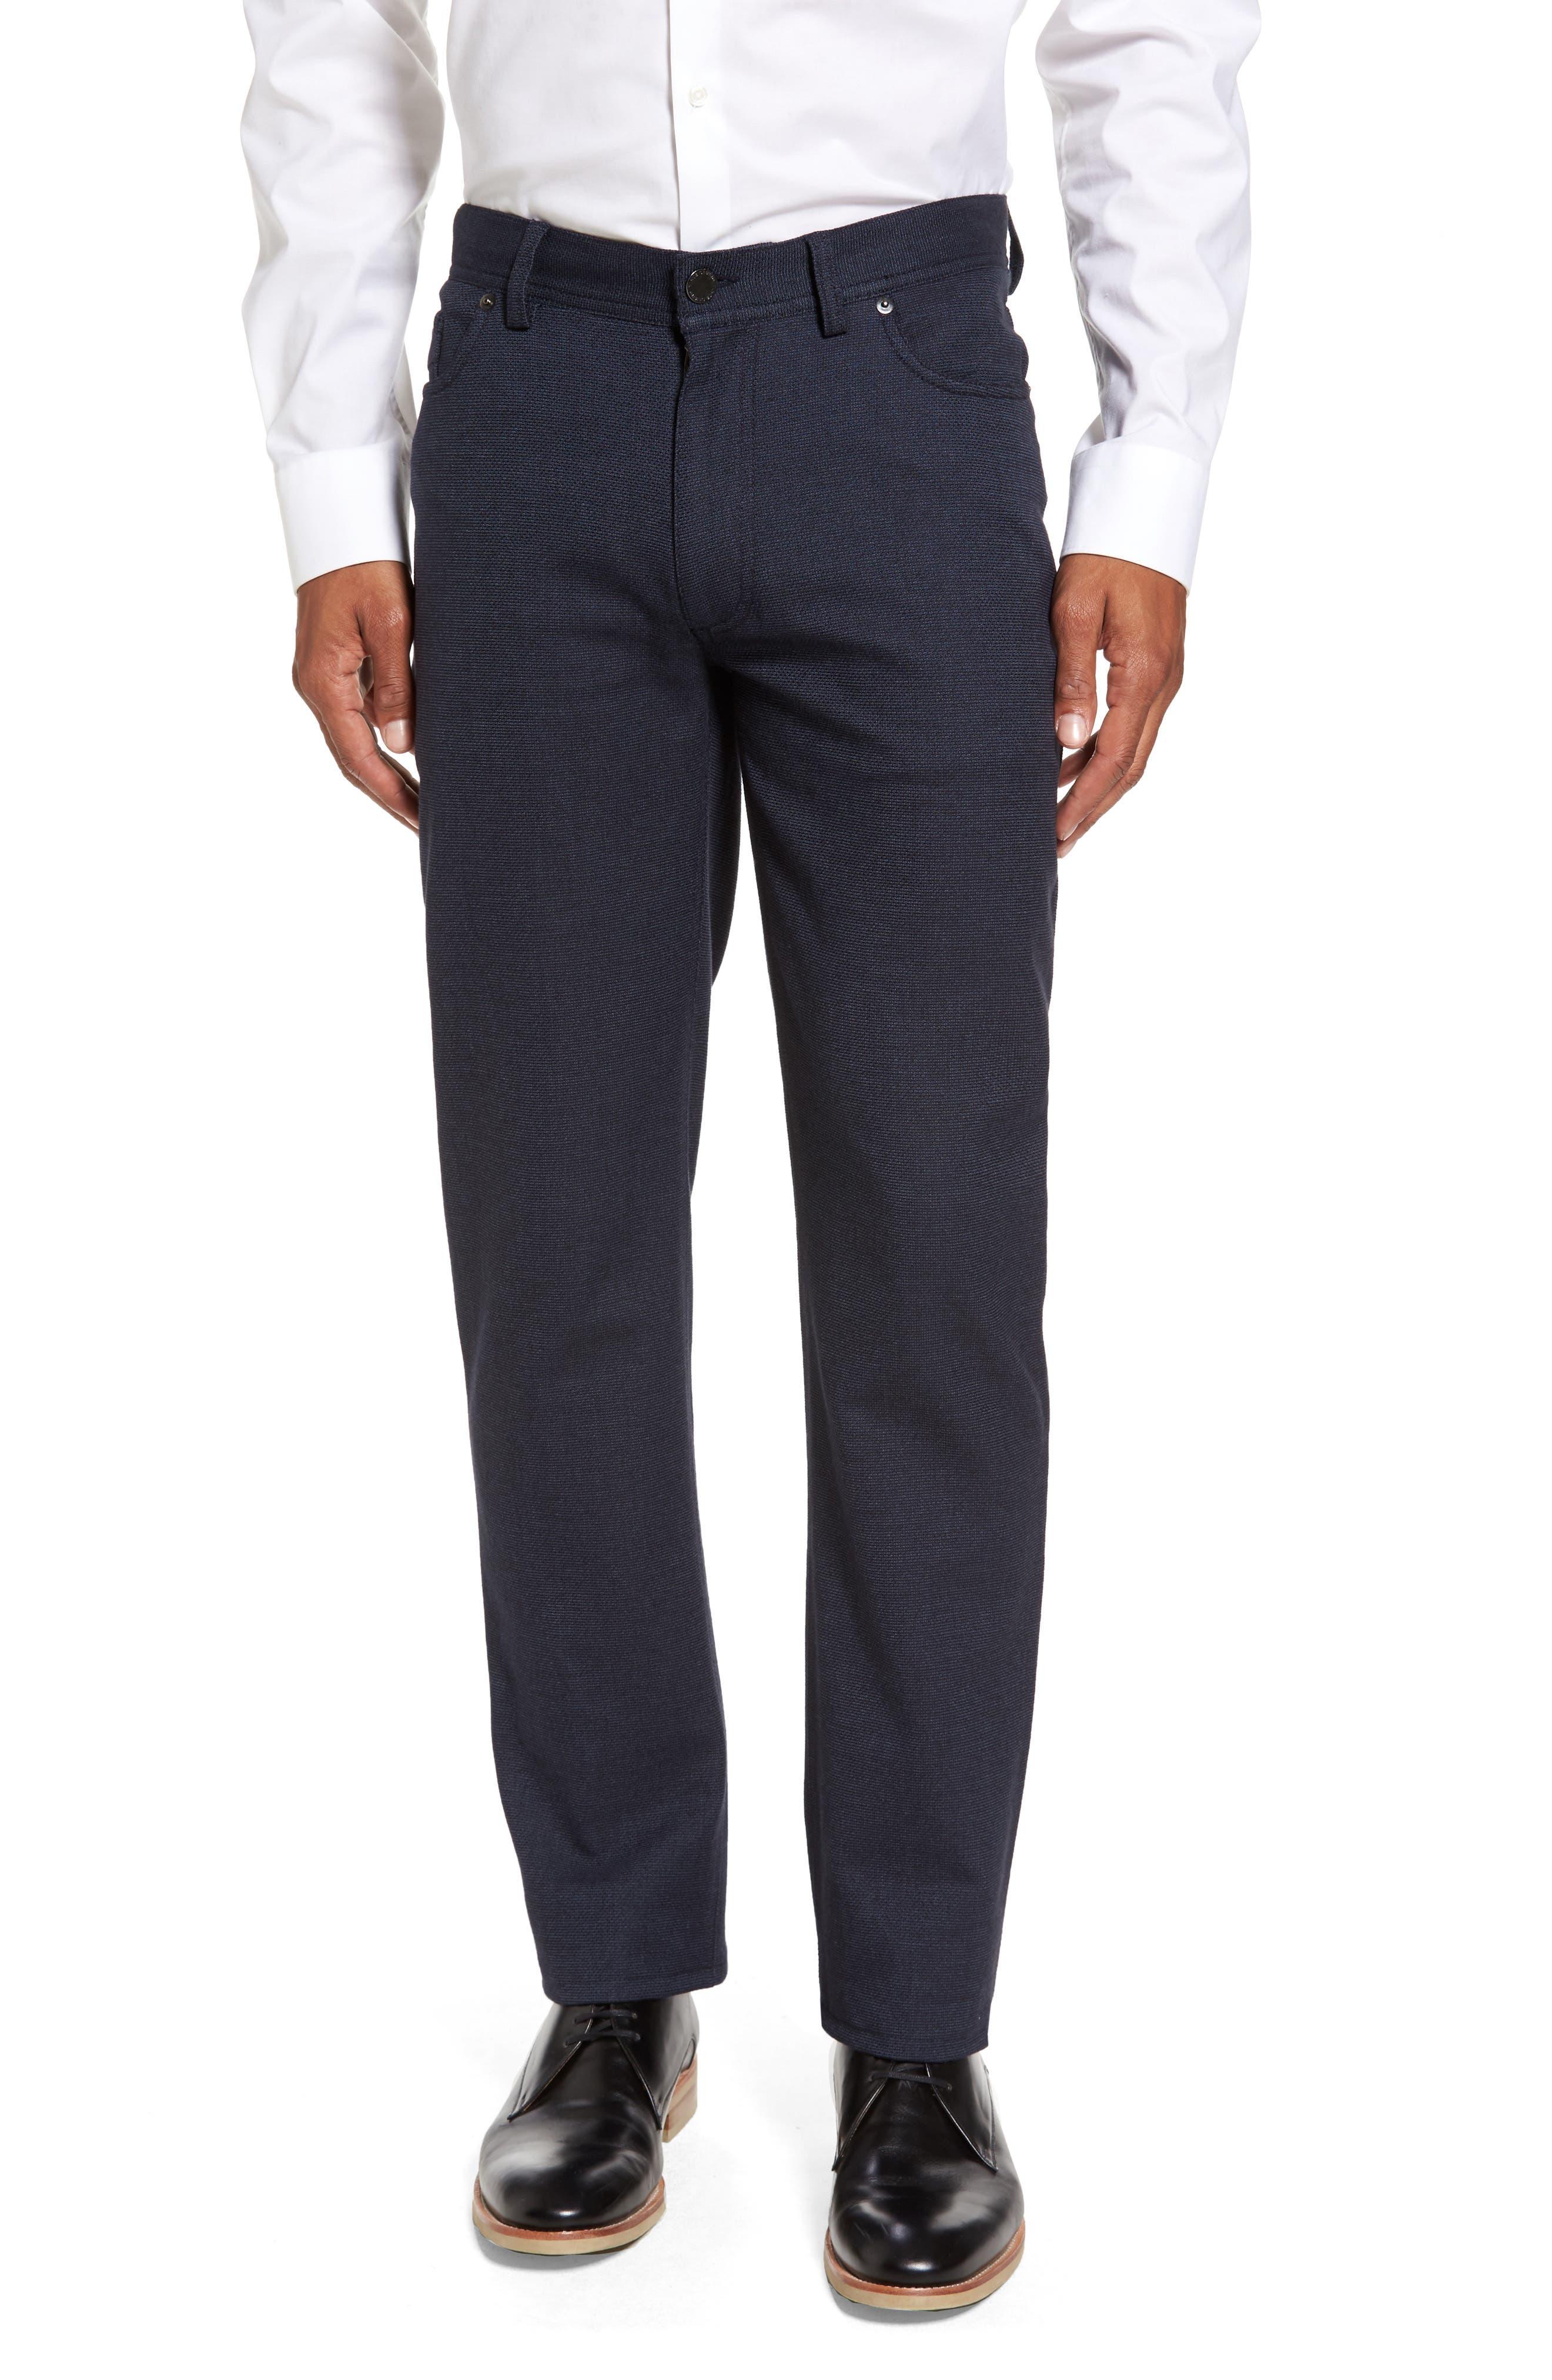 Vince Slim Fit Stretch Five-Pocket Pants,                             Main thumbnail 1, color,                             Navy Digital Neat